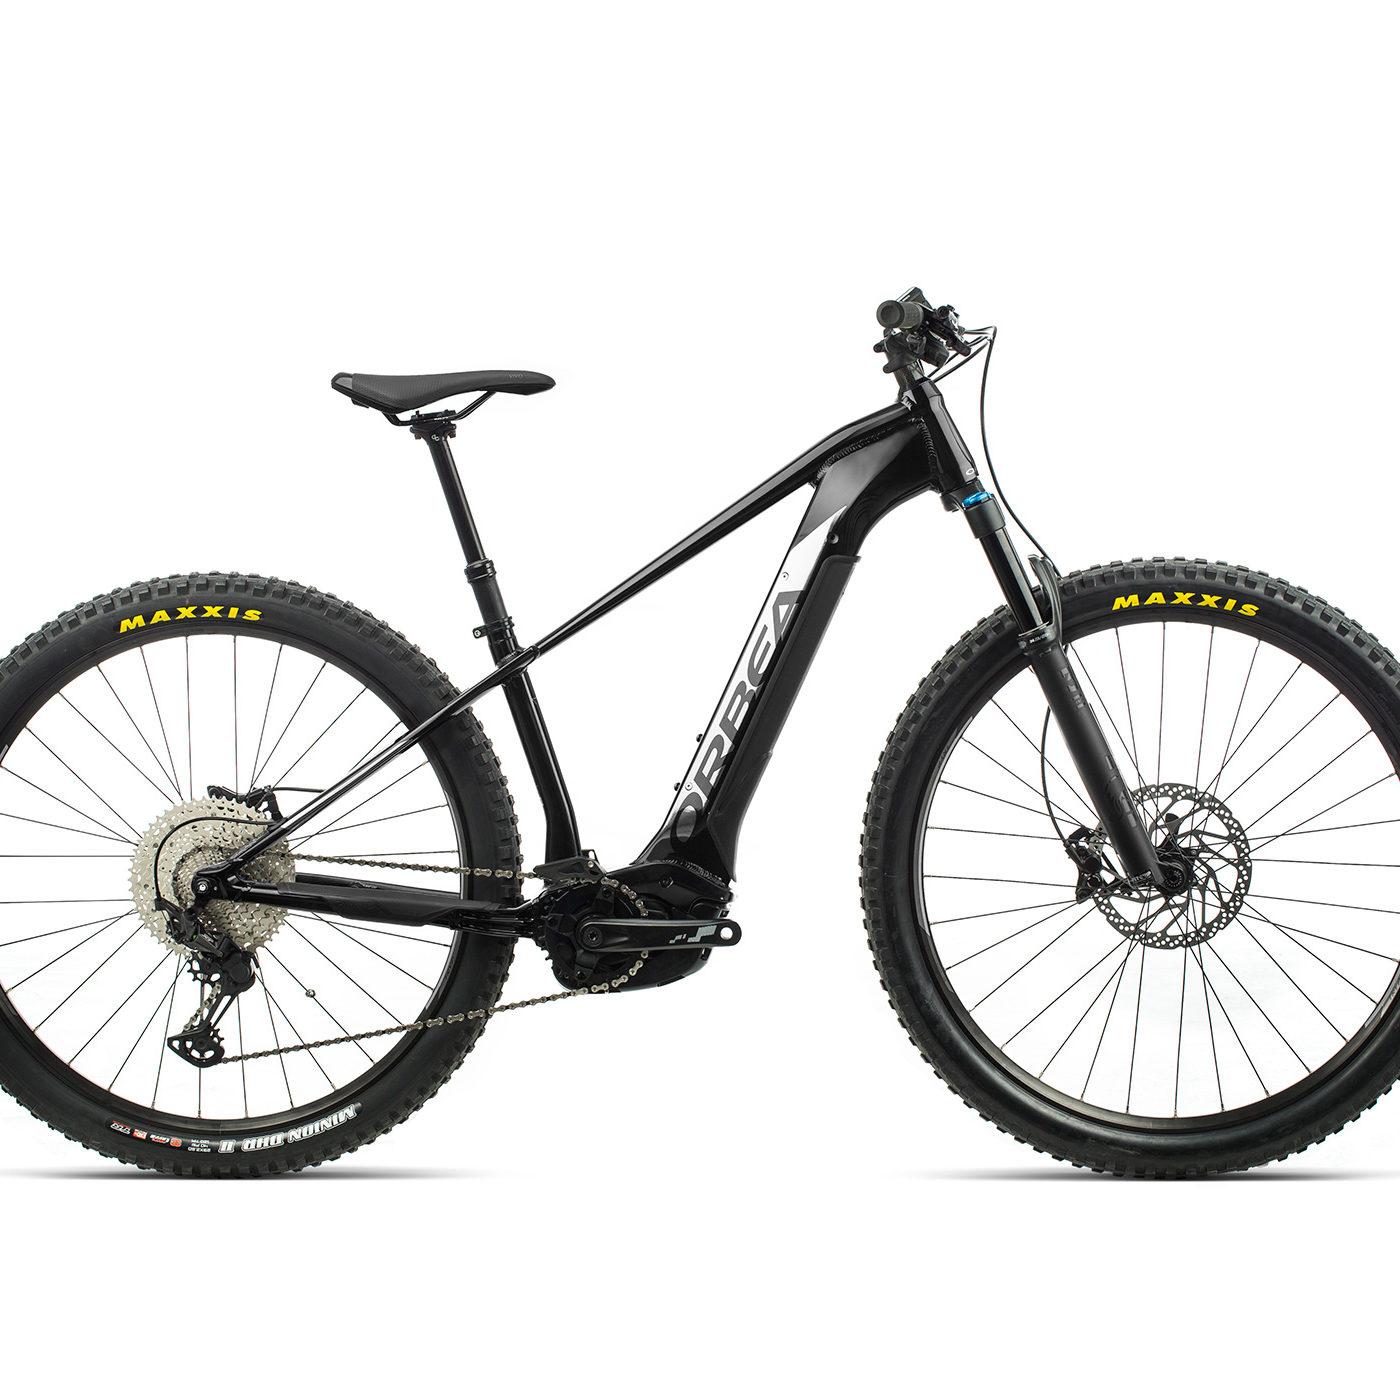 ORBEA WILD HT20 29 ebike - METALLIC ZWART / TITANIUM(GLOSS) @G-Bikes